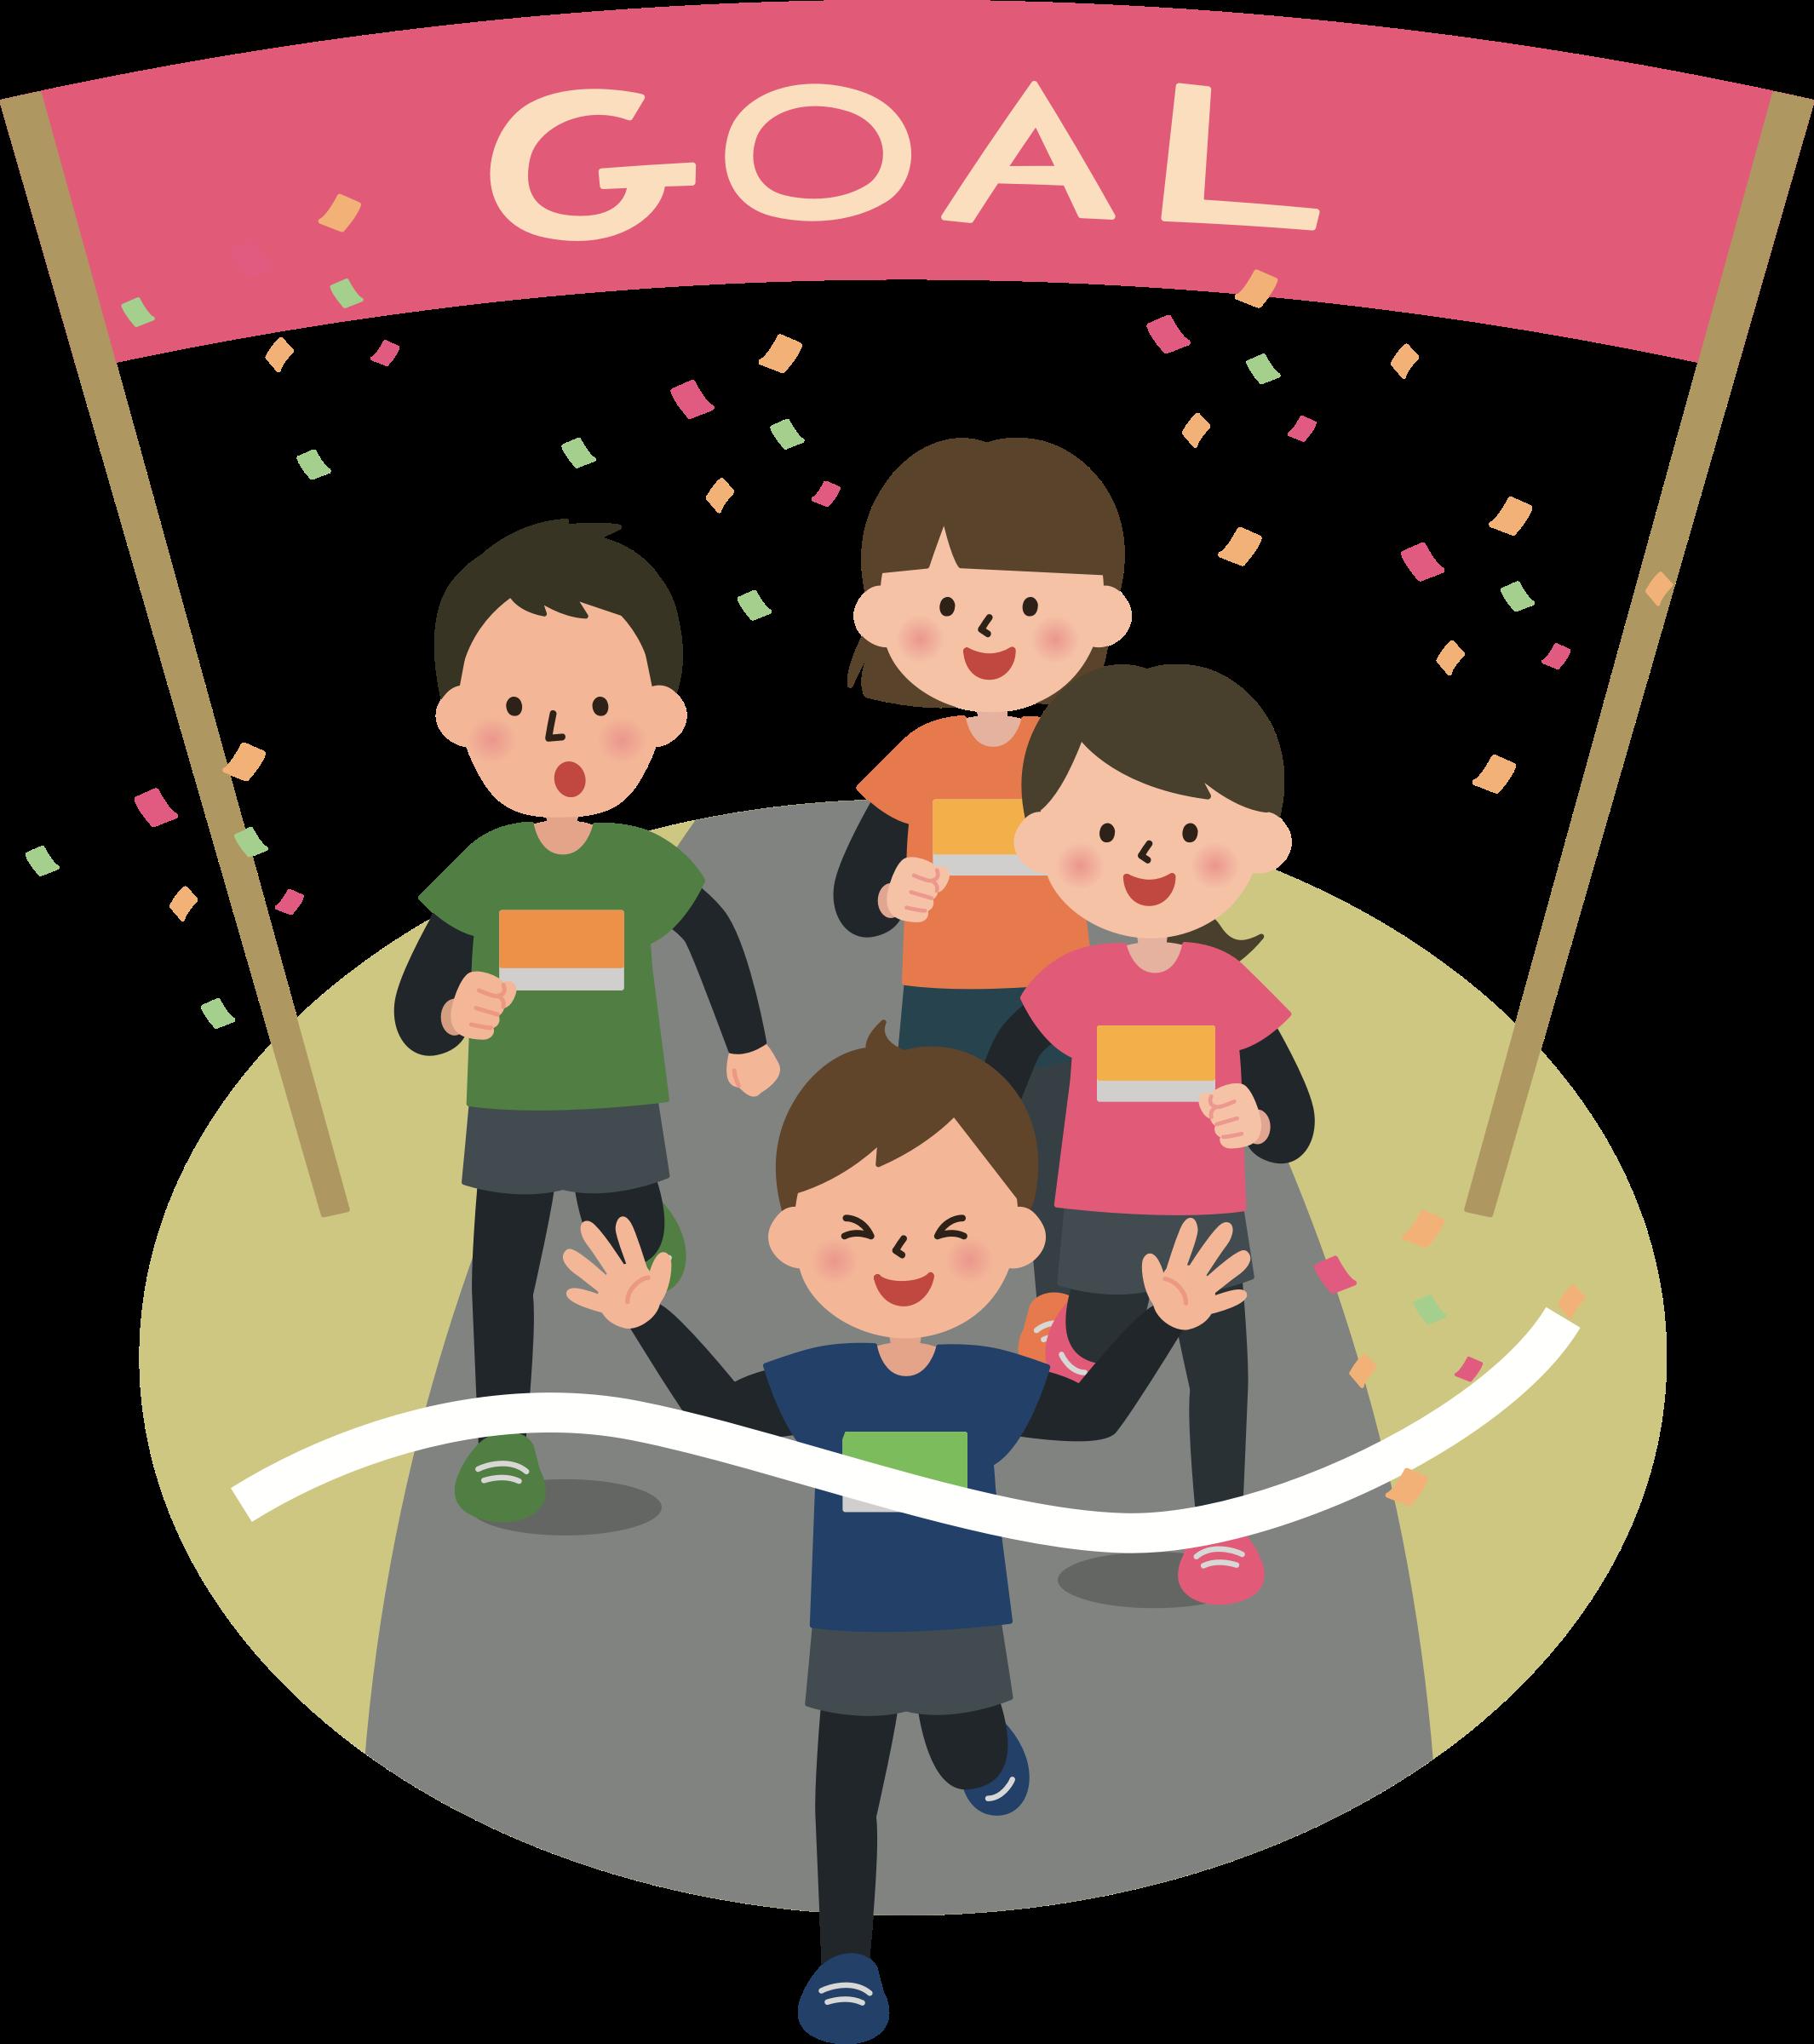 Goals clipart ambitious person. Finish line big image